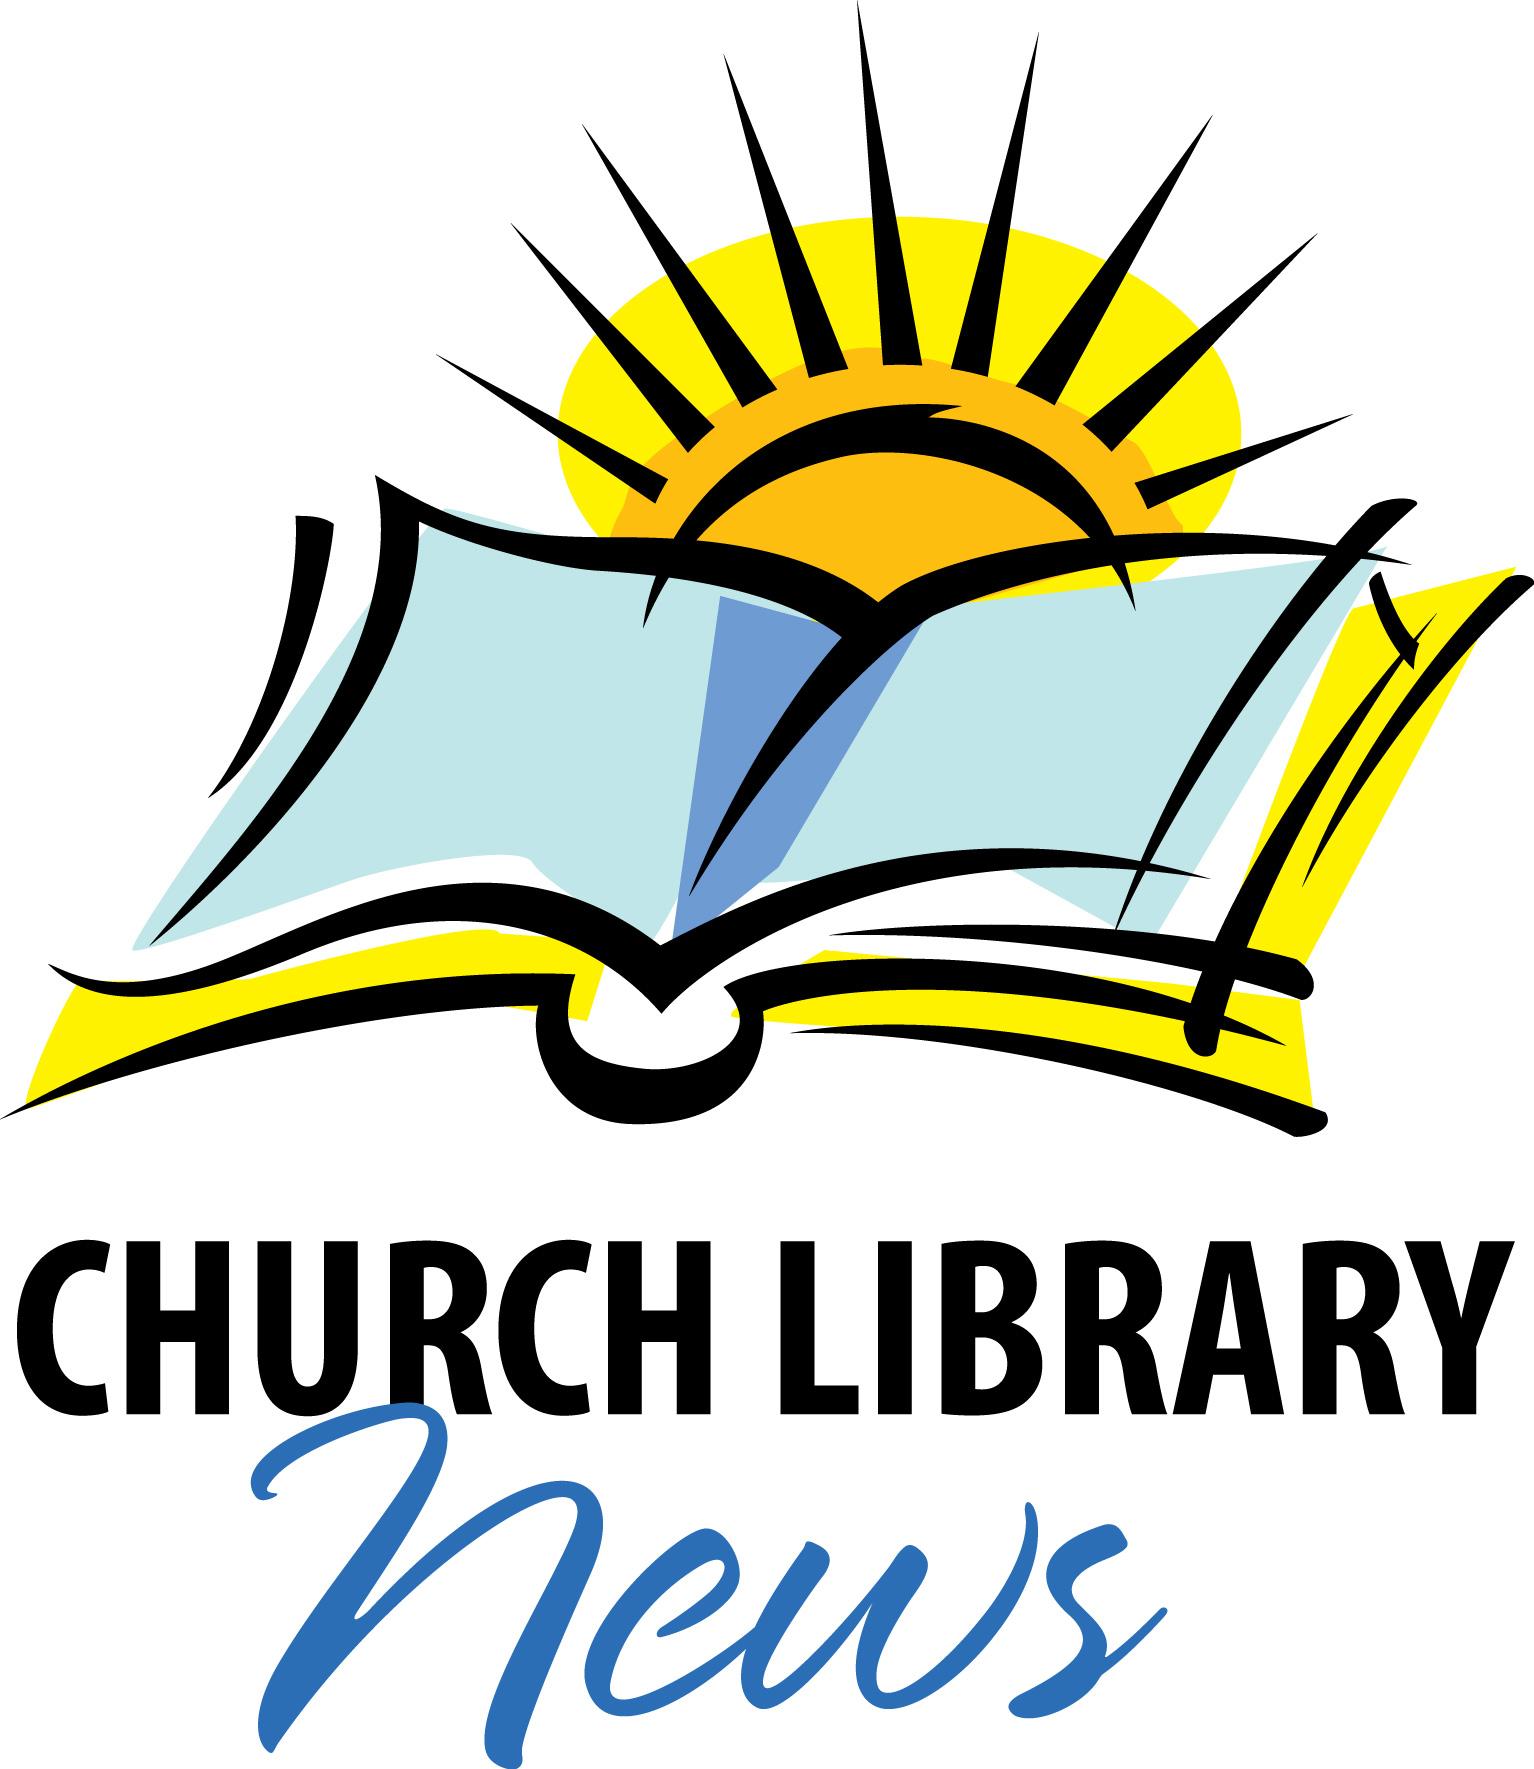 Library clipart news  Church Lutheran Church Library